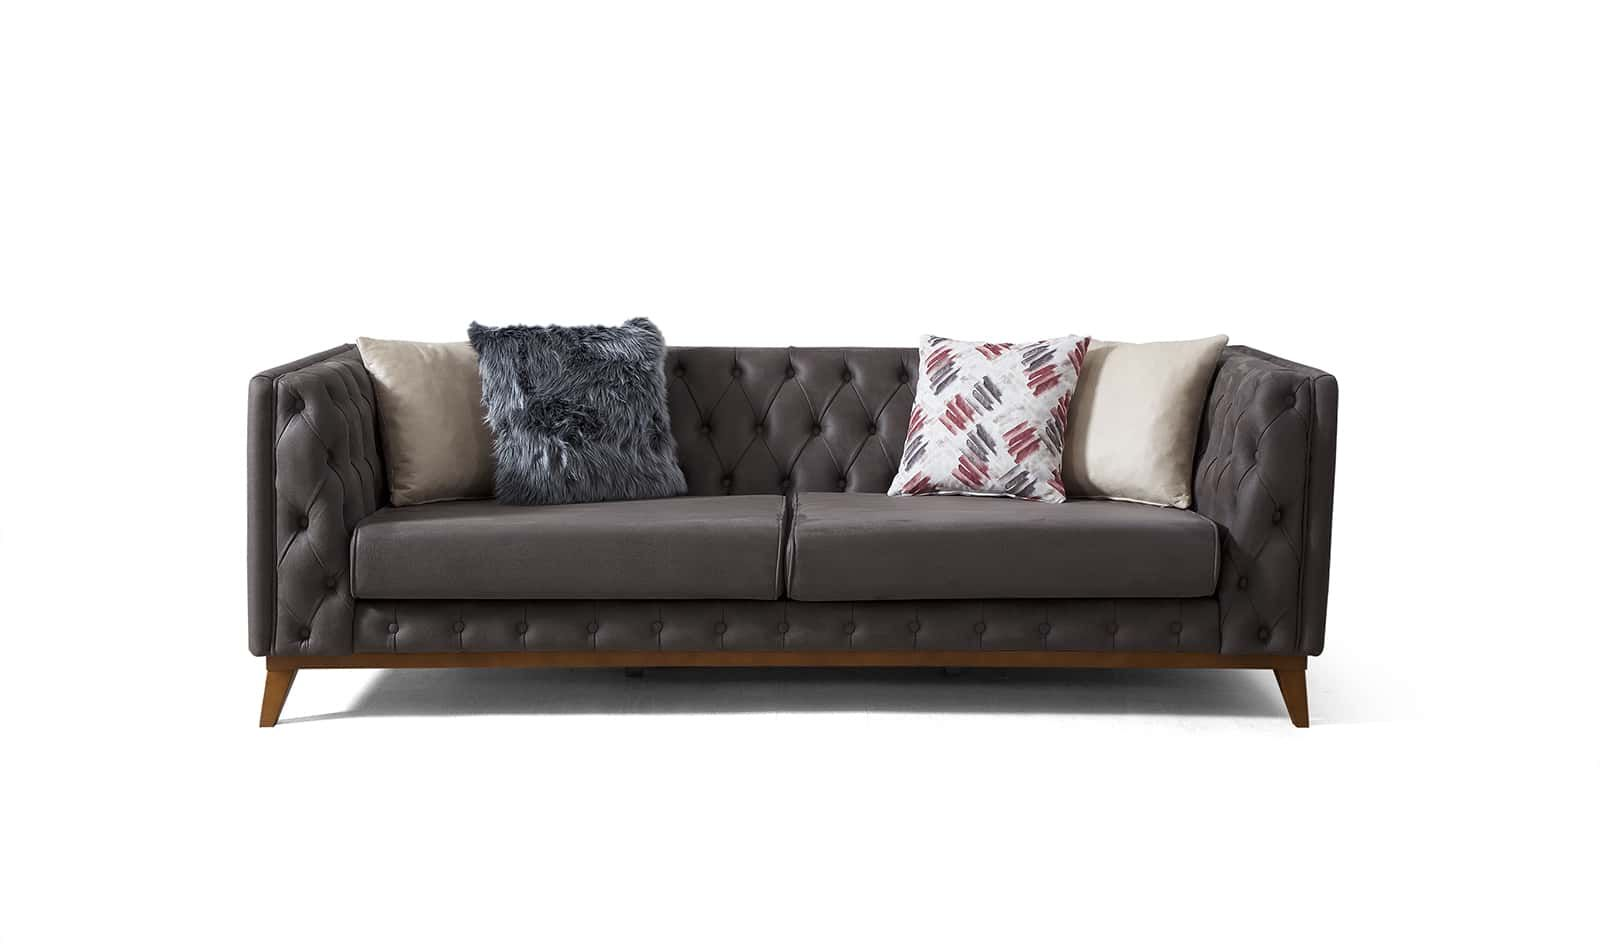 Nisa Koltuk Takimi Sofa Furniture Decor